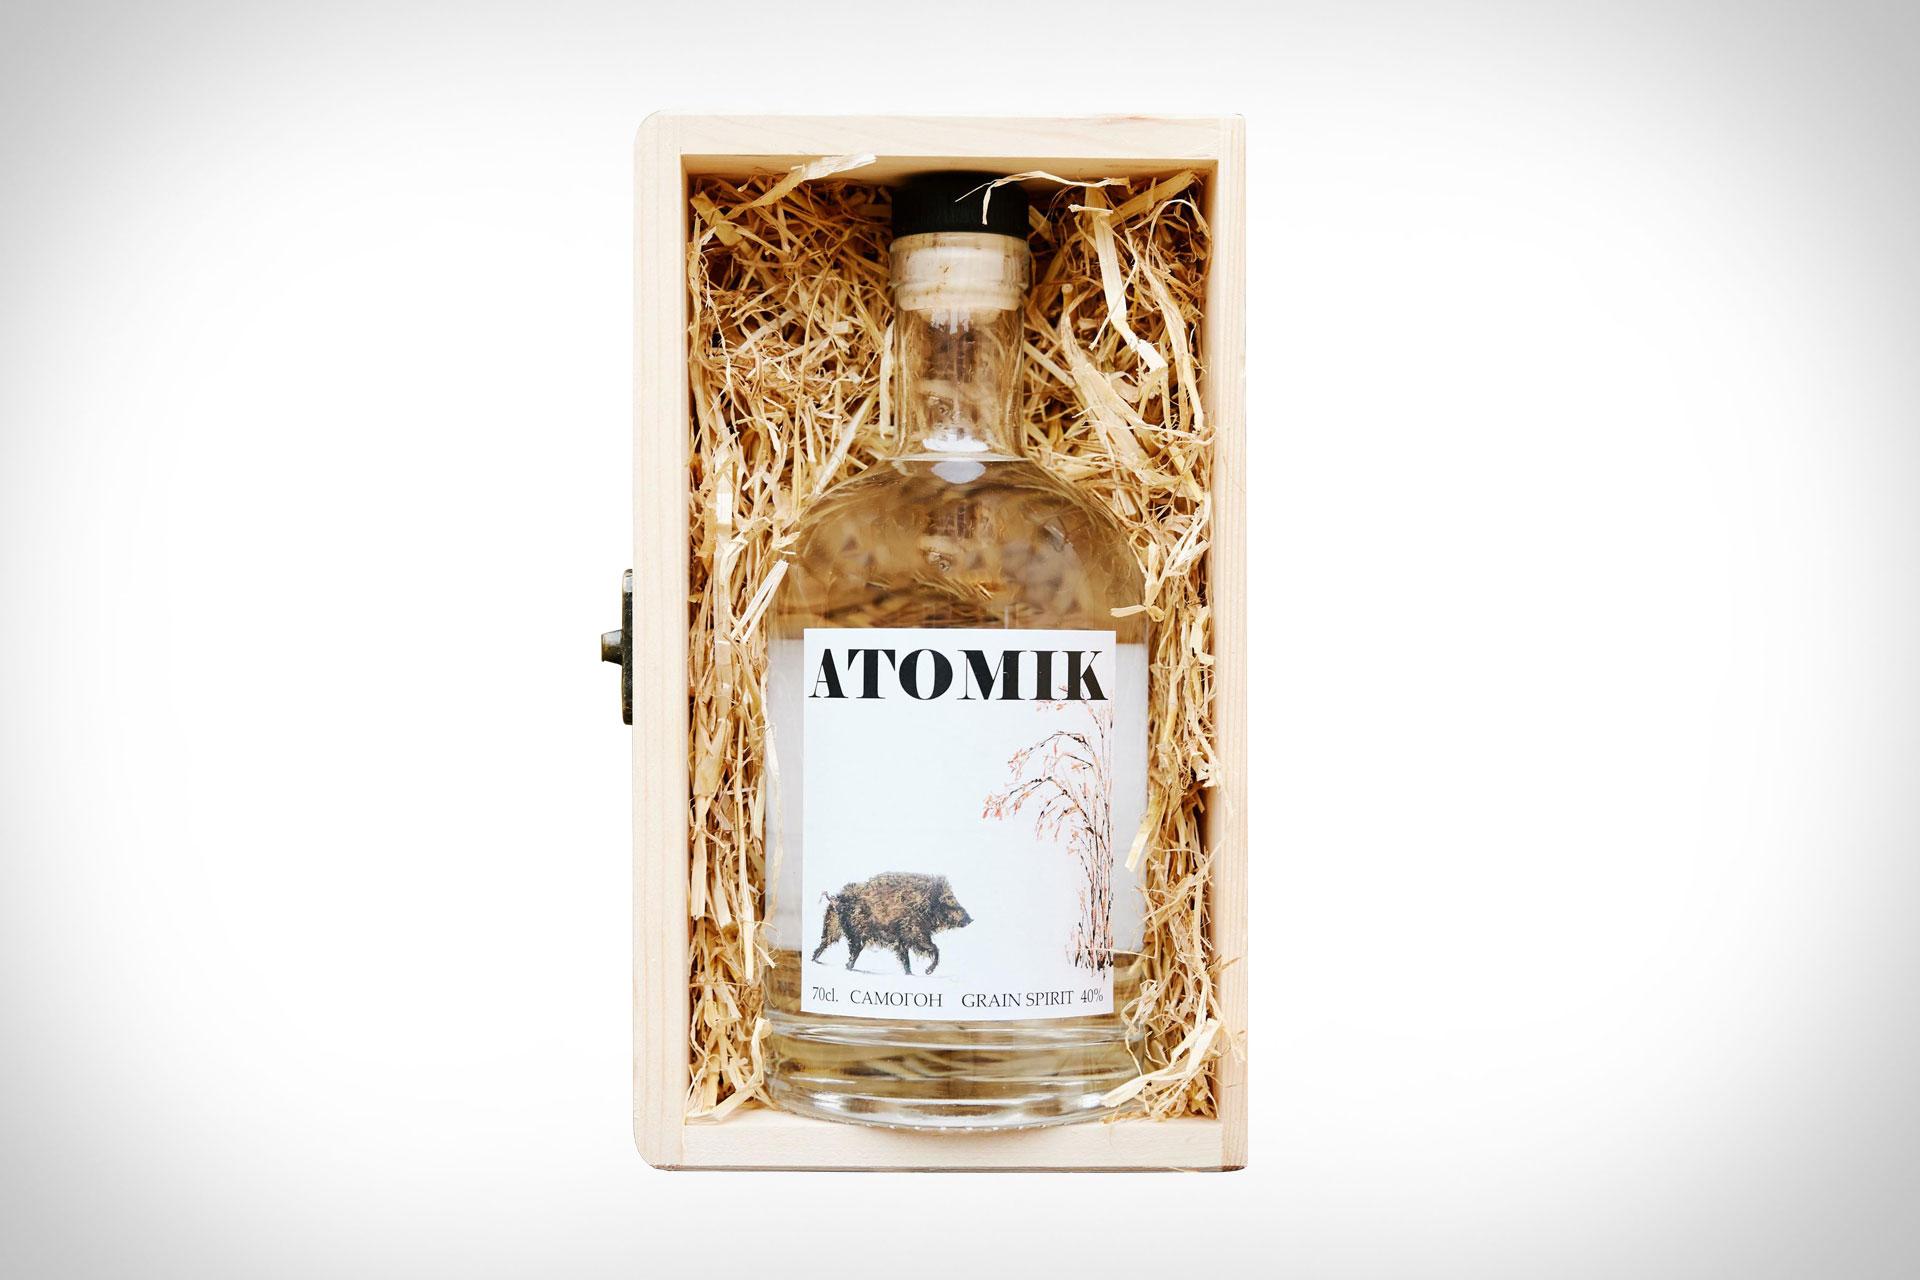 Atomik Chernobyl Exclusion Zone Vodka